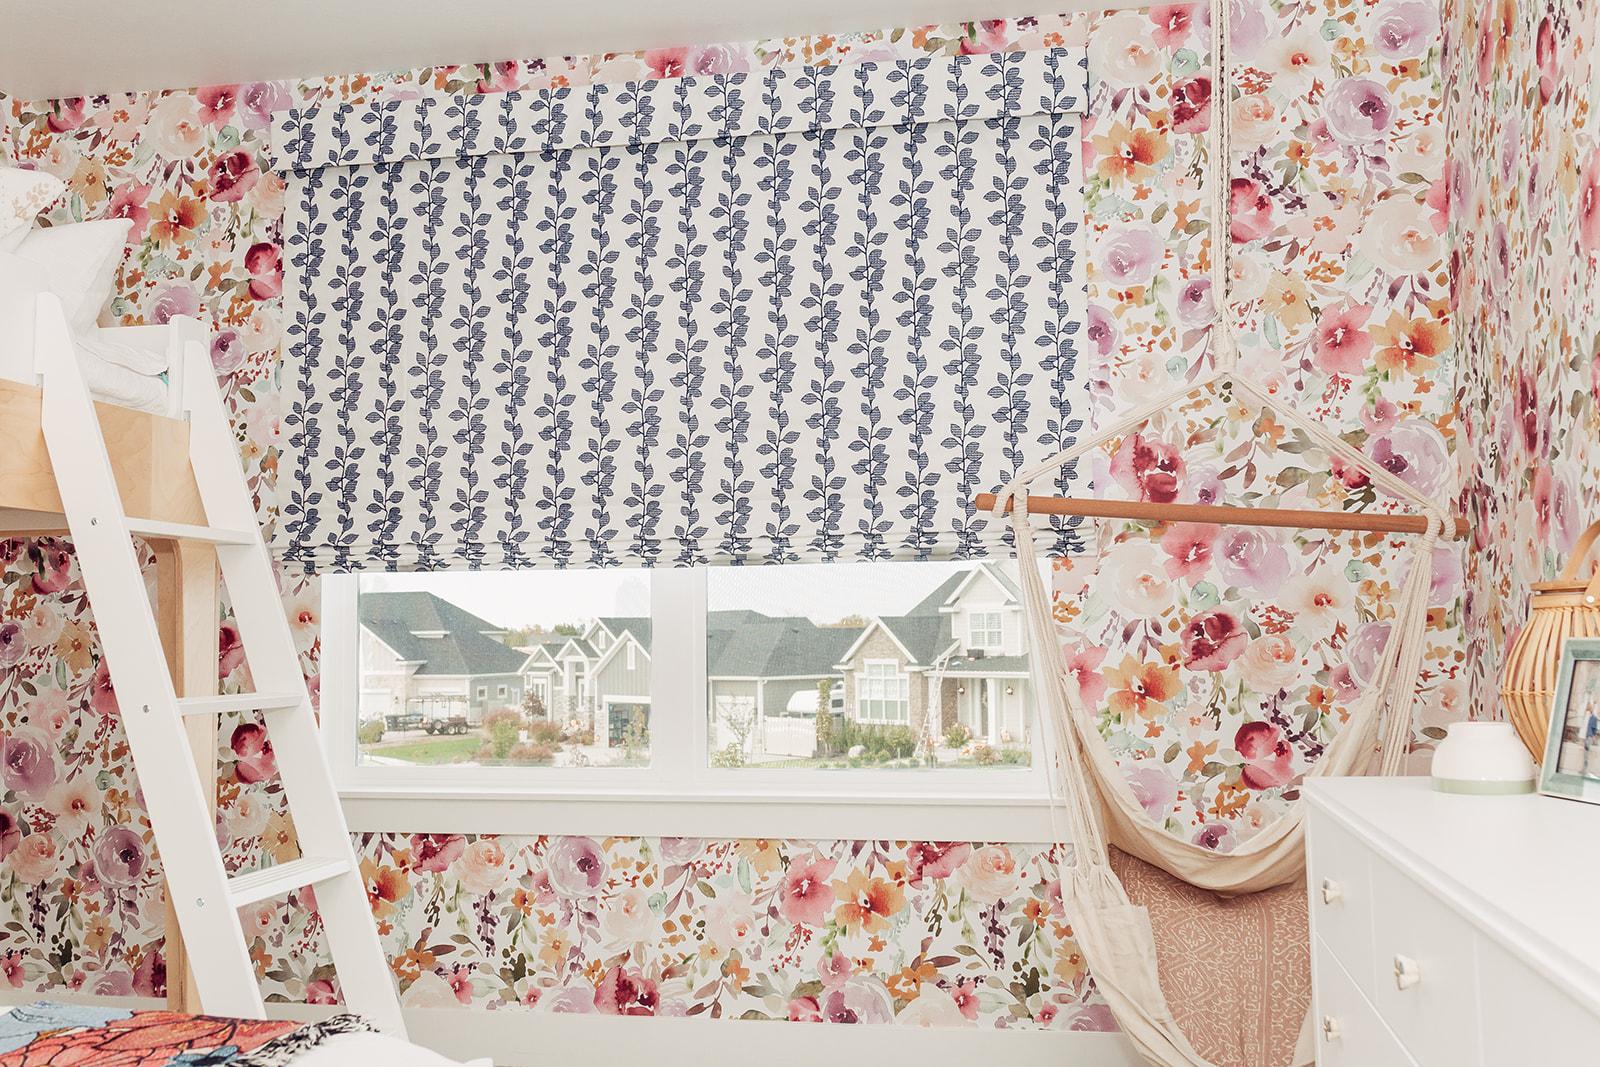 Demi and Mollie Room reveal www.twistmepretty.com